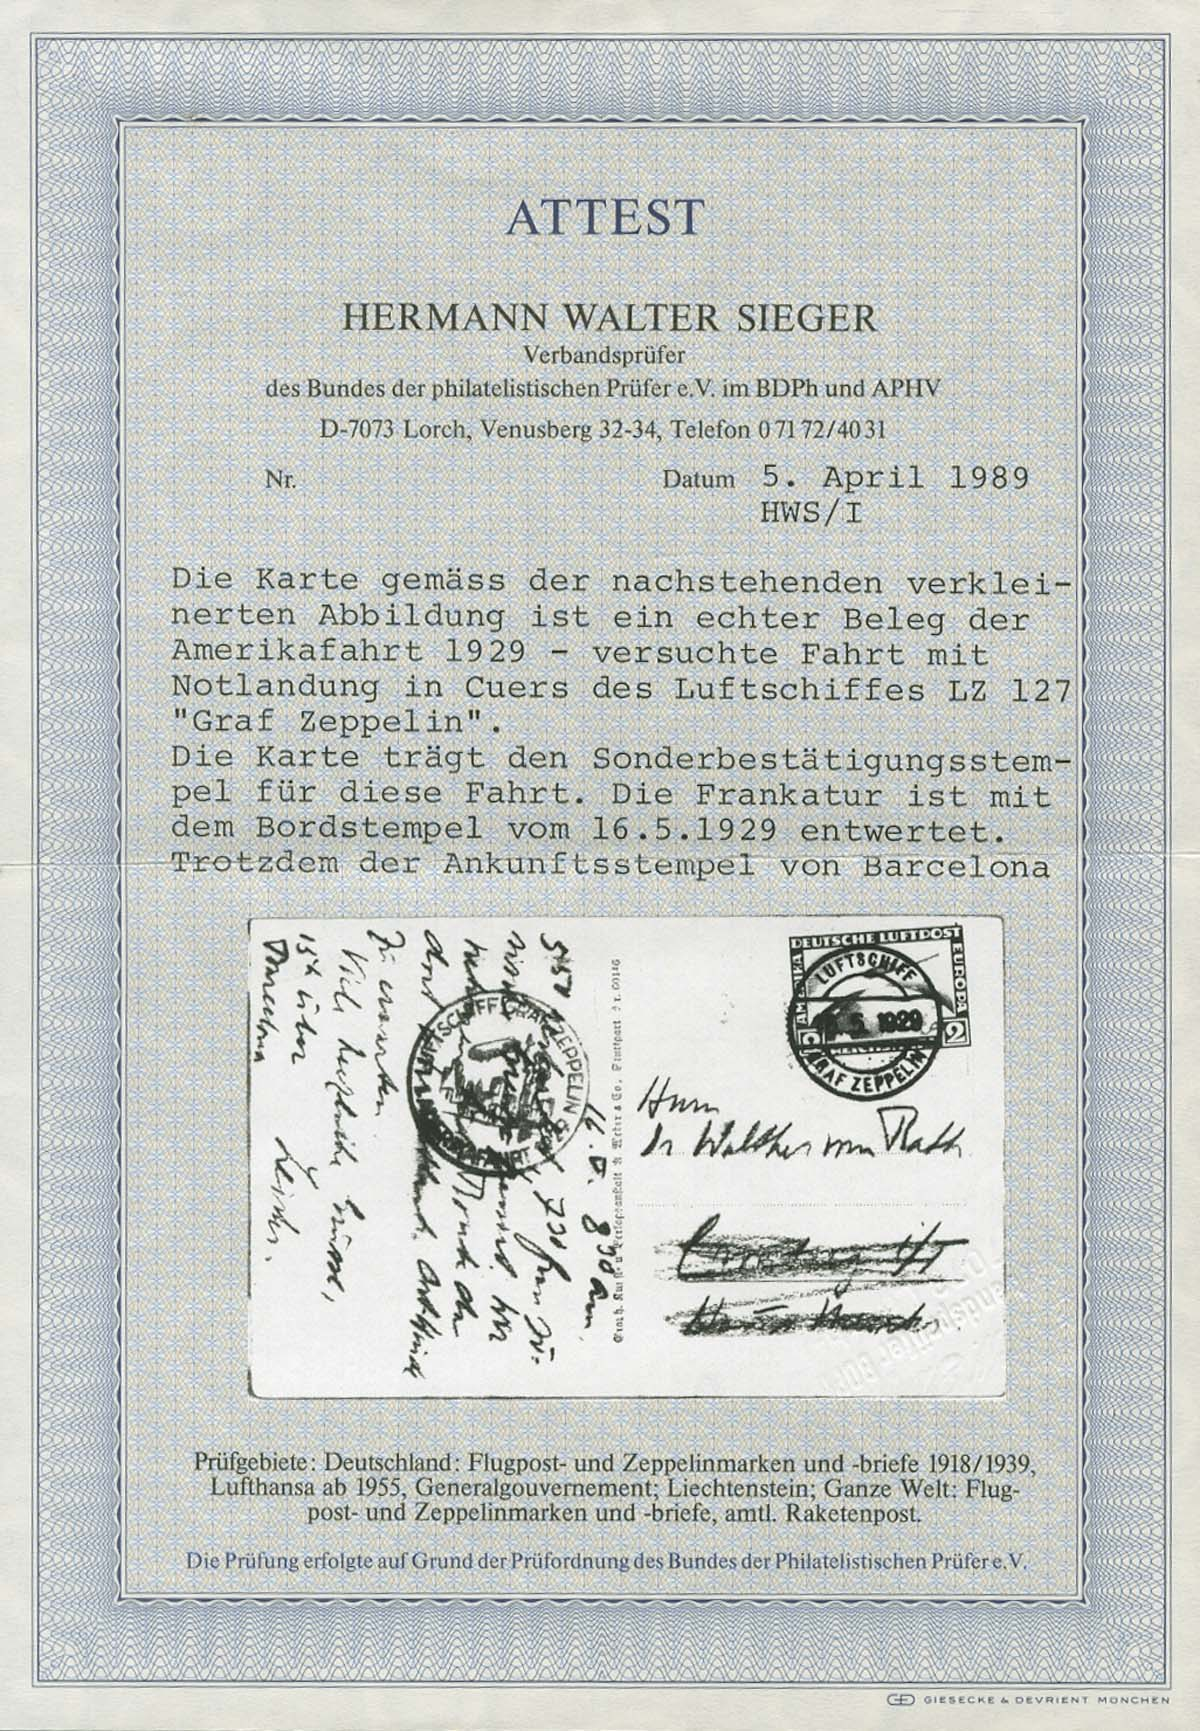 Lot 3044 - Zeppelinpost nach Sieger LZ 127 1929  -  Auktionshaus Ulrich Felzmann GmbH & Co. KG Auction 169